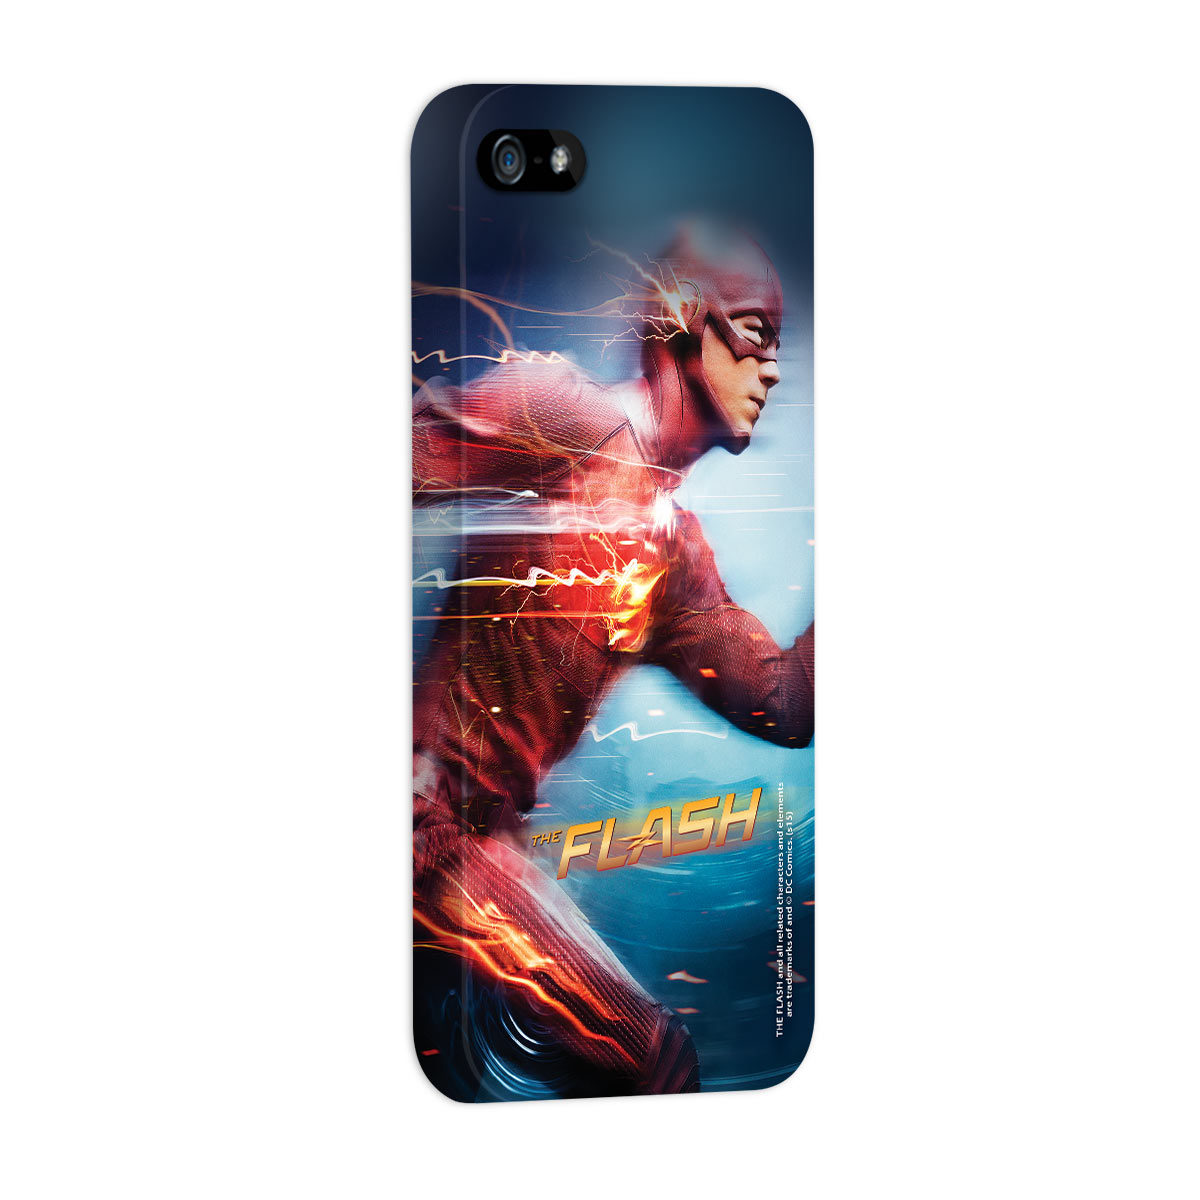 Capa para iPhone 5/5S The Flash Serie Running